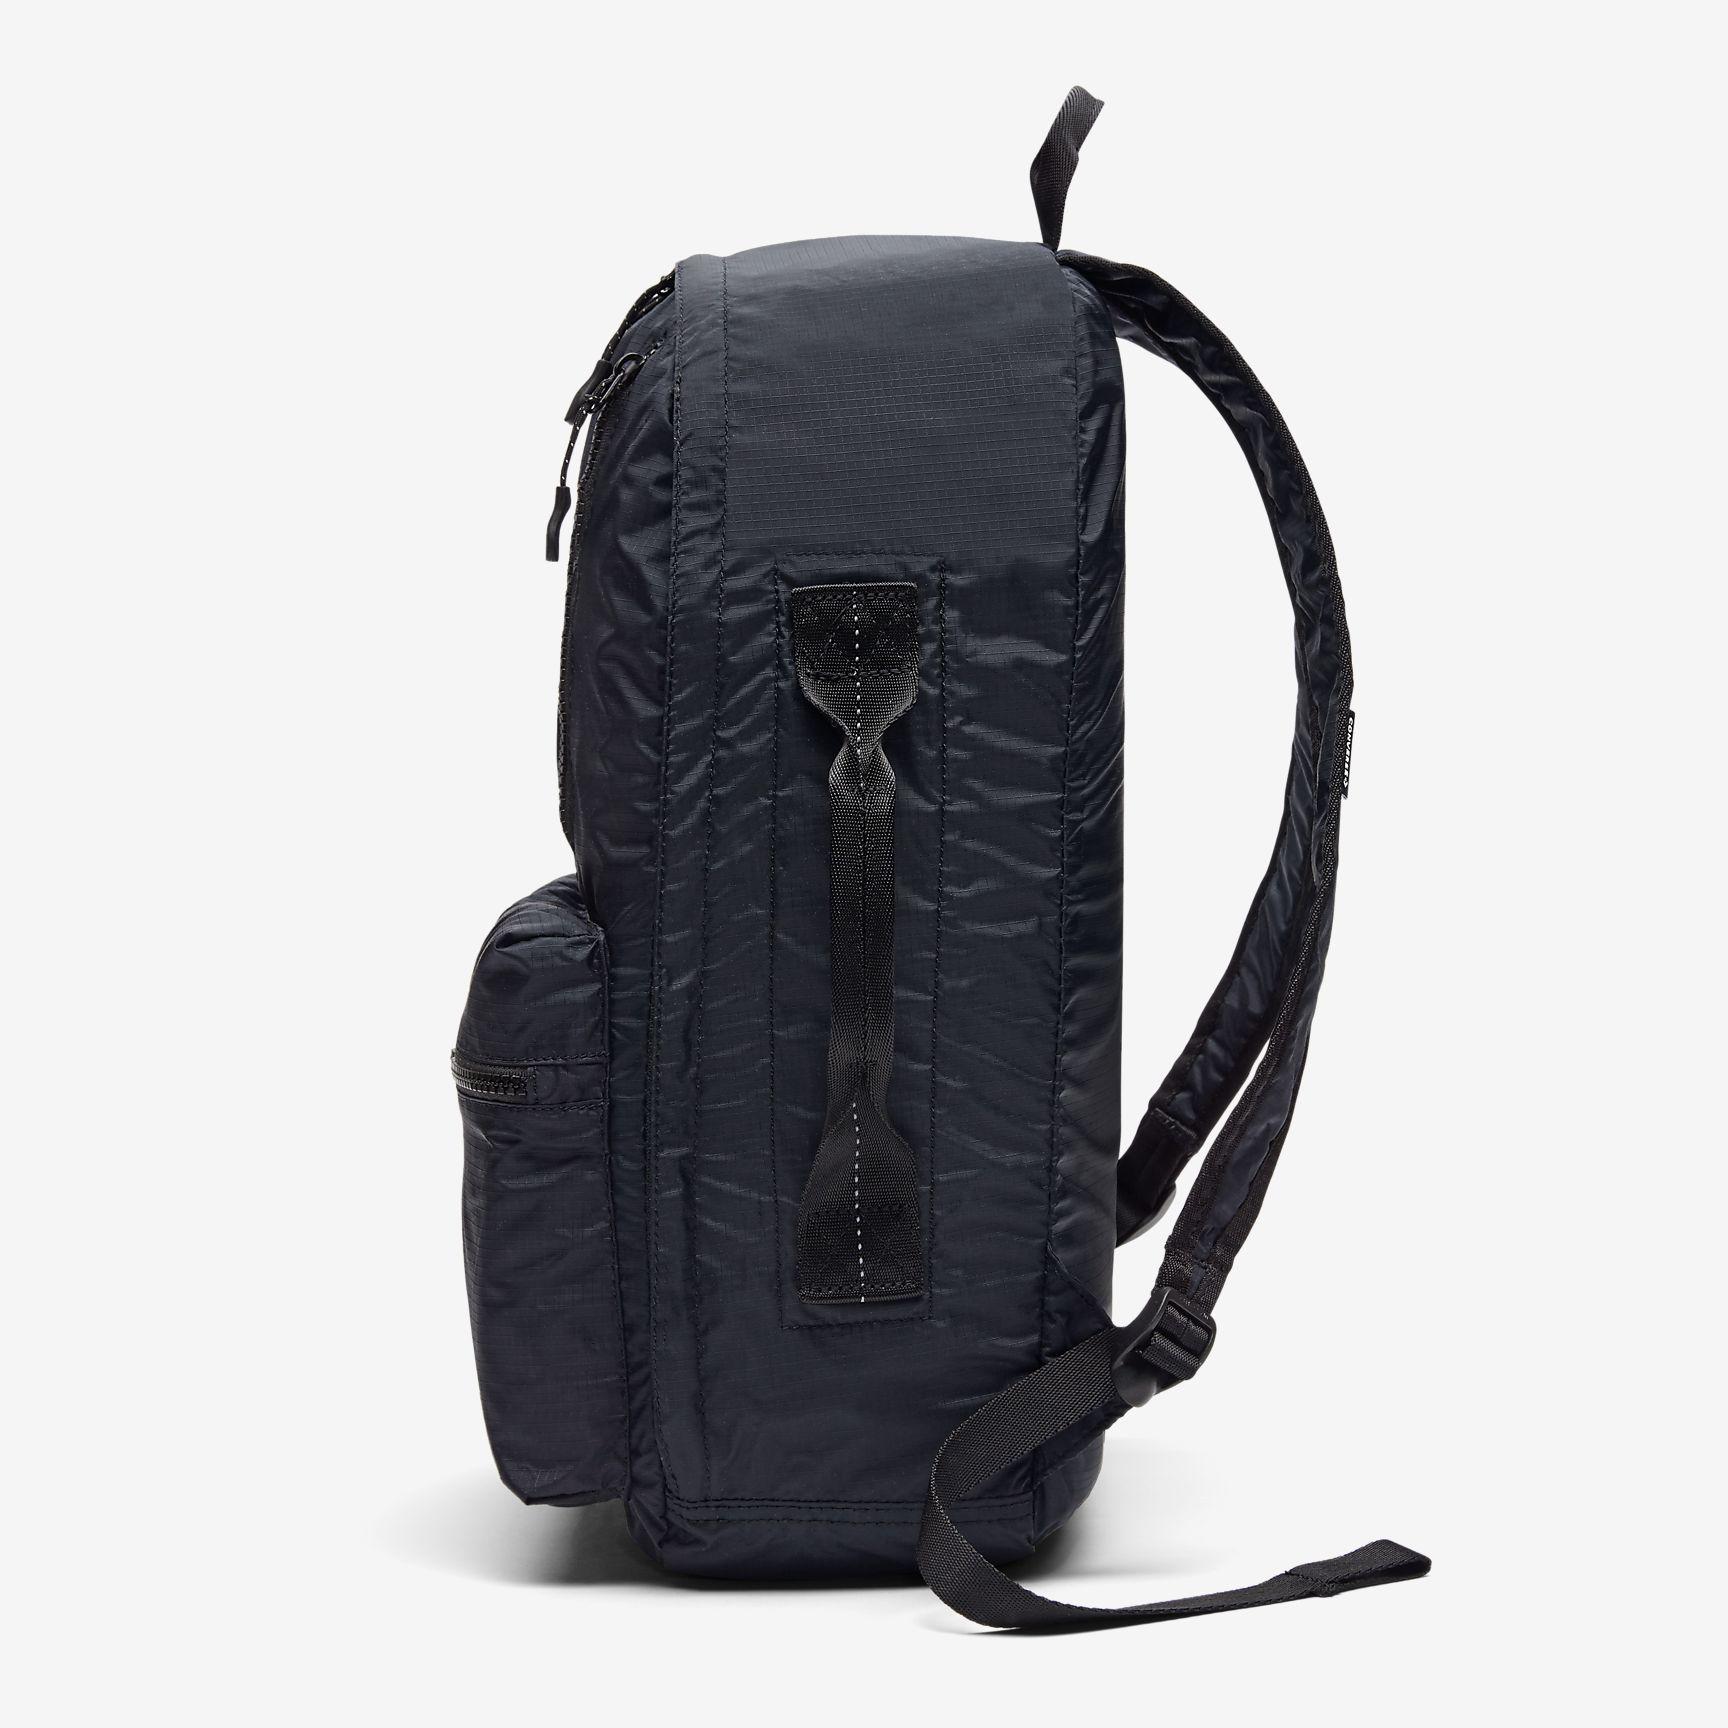 259506d2363f Converse Packable 22L Backpack - Backpacks Backpacks - Sporting ...